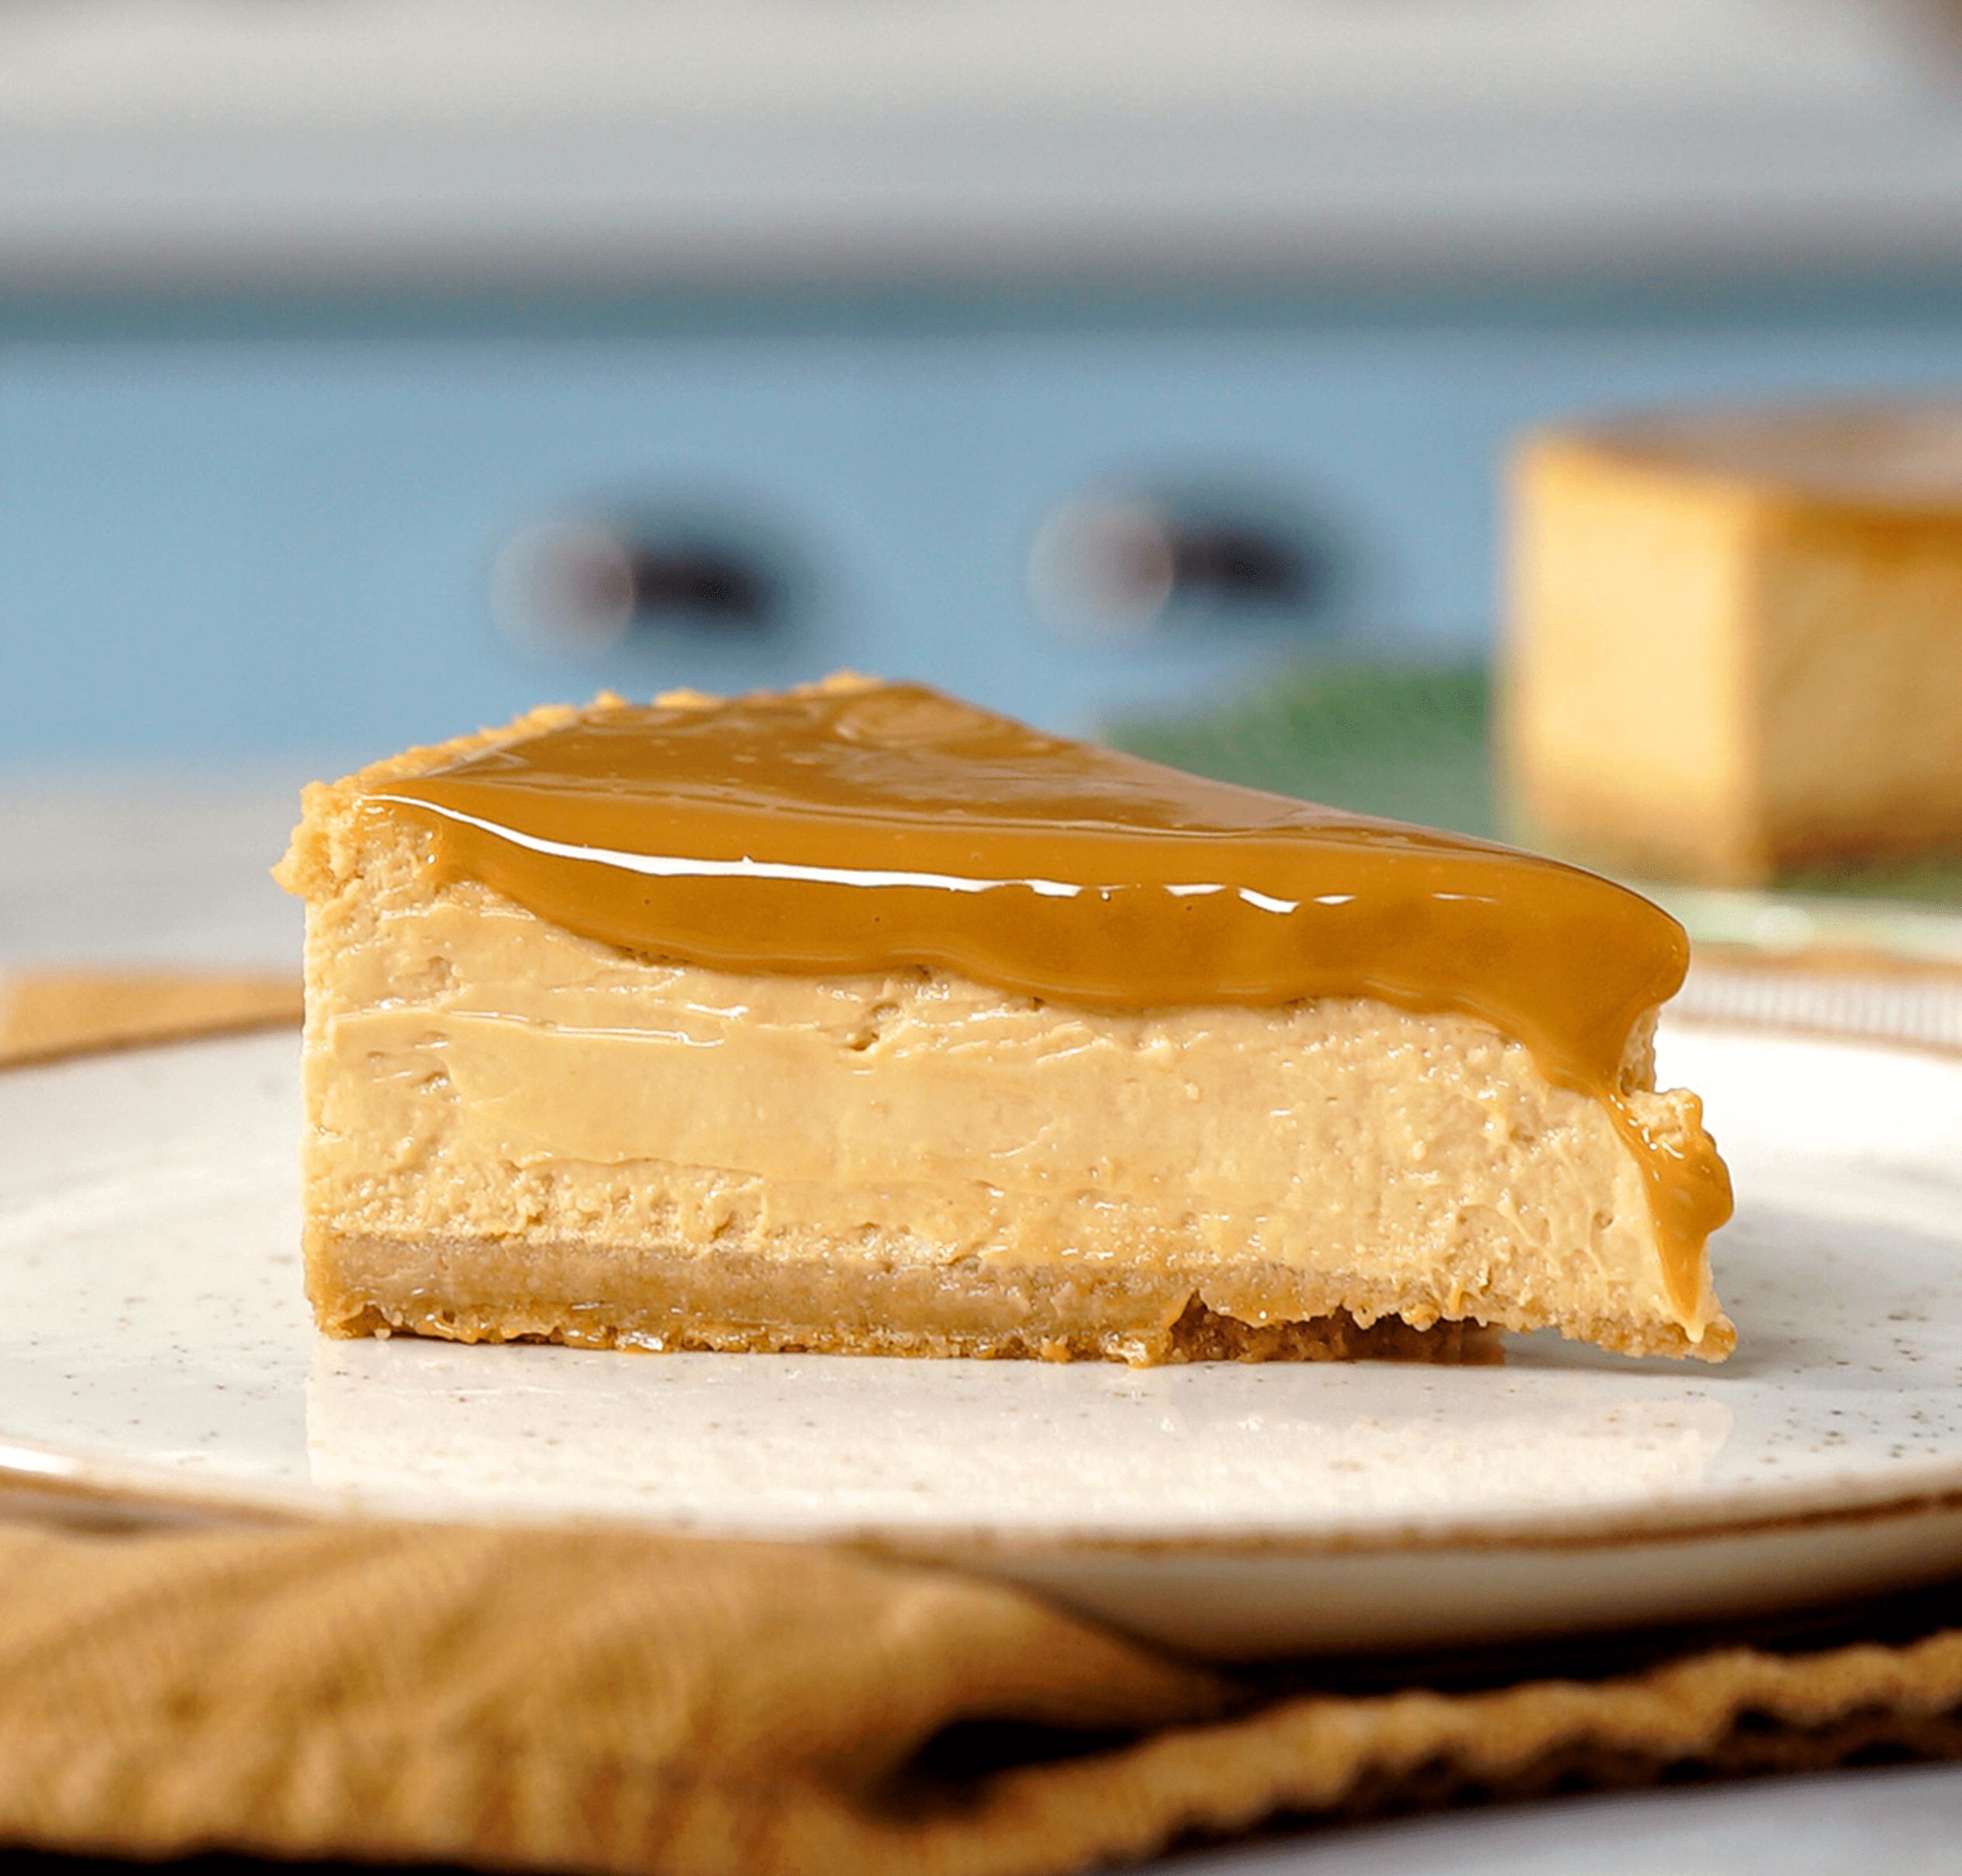 assados-cheesecake-doce-leite-oliveira